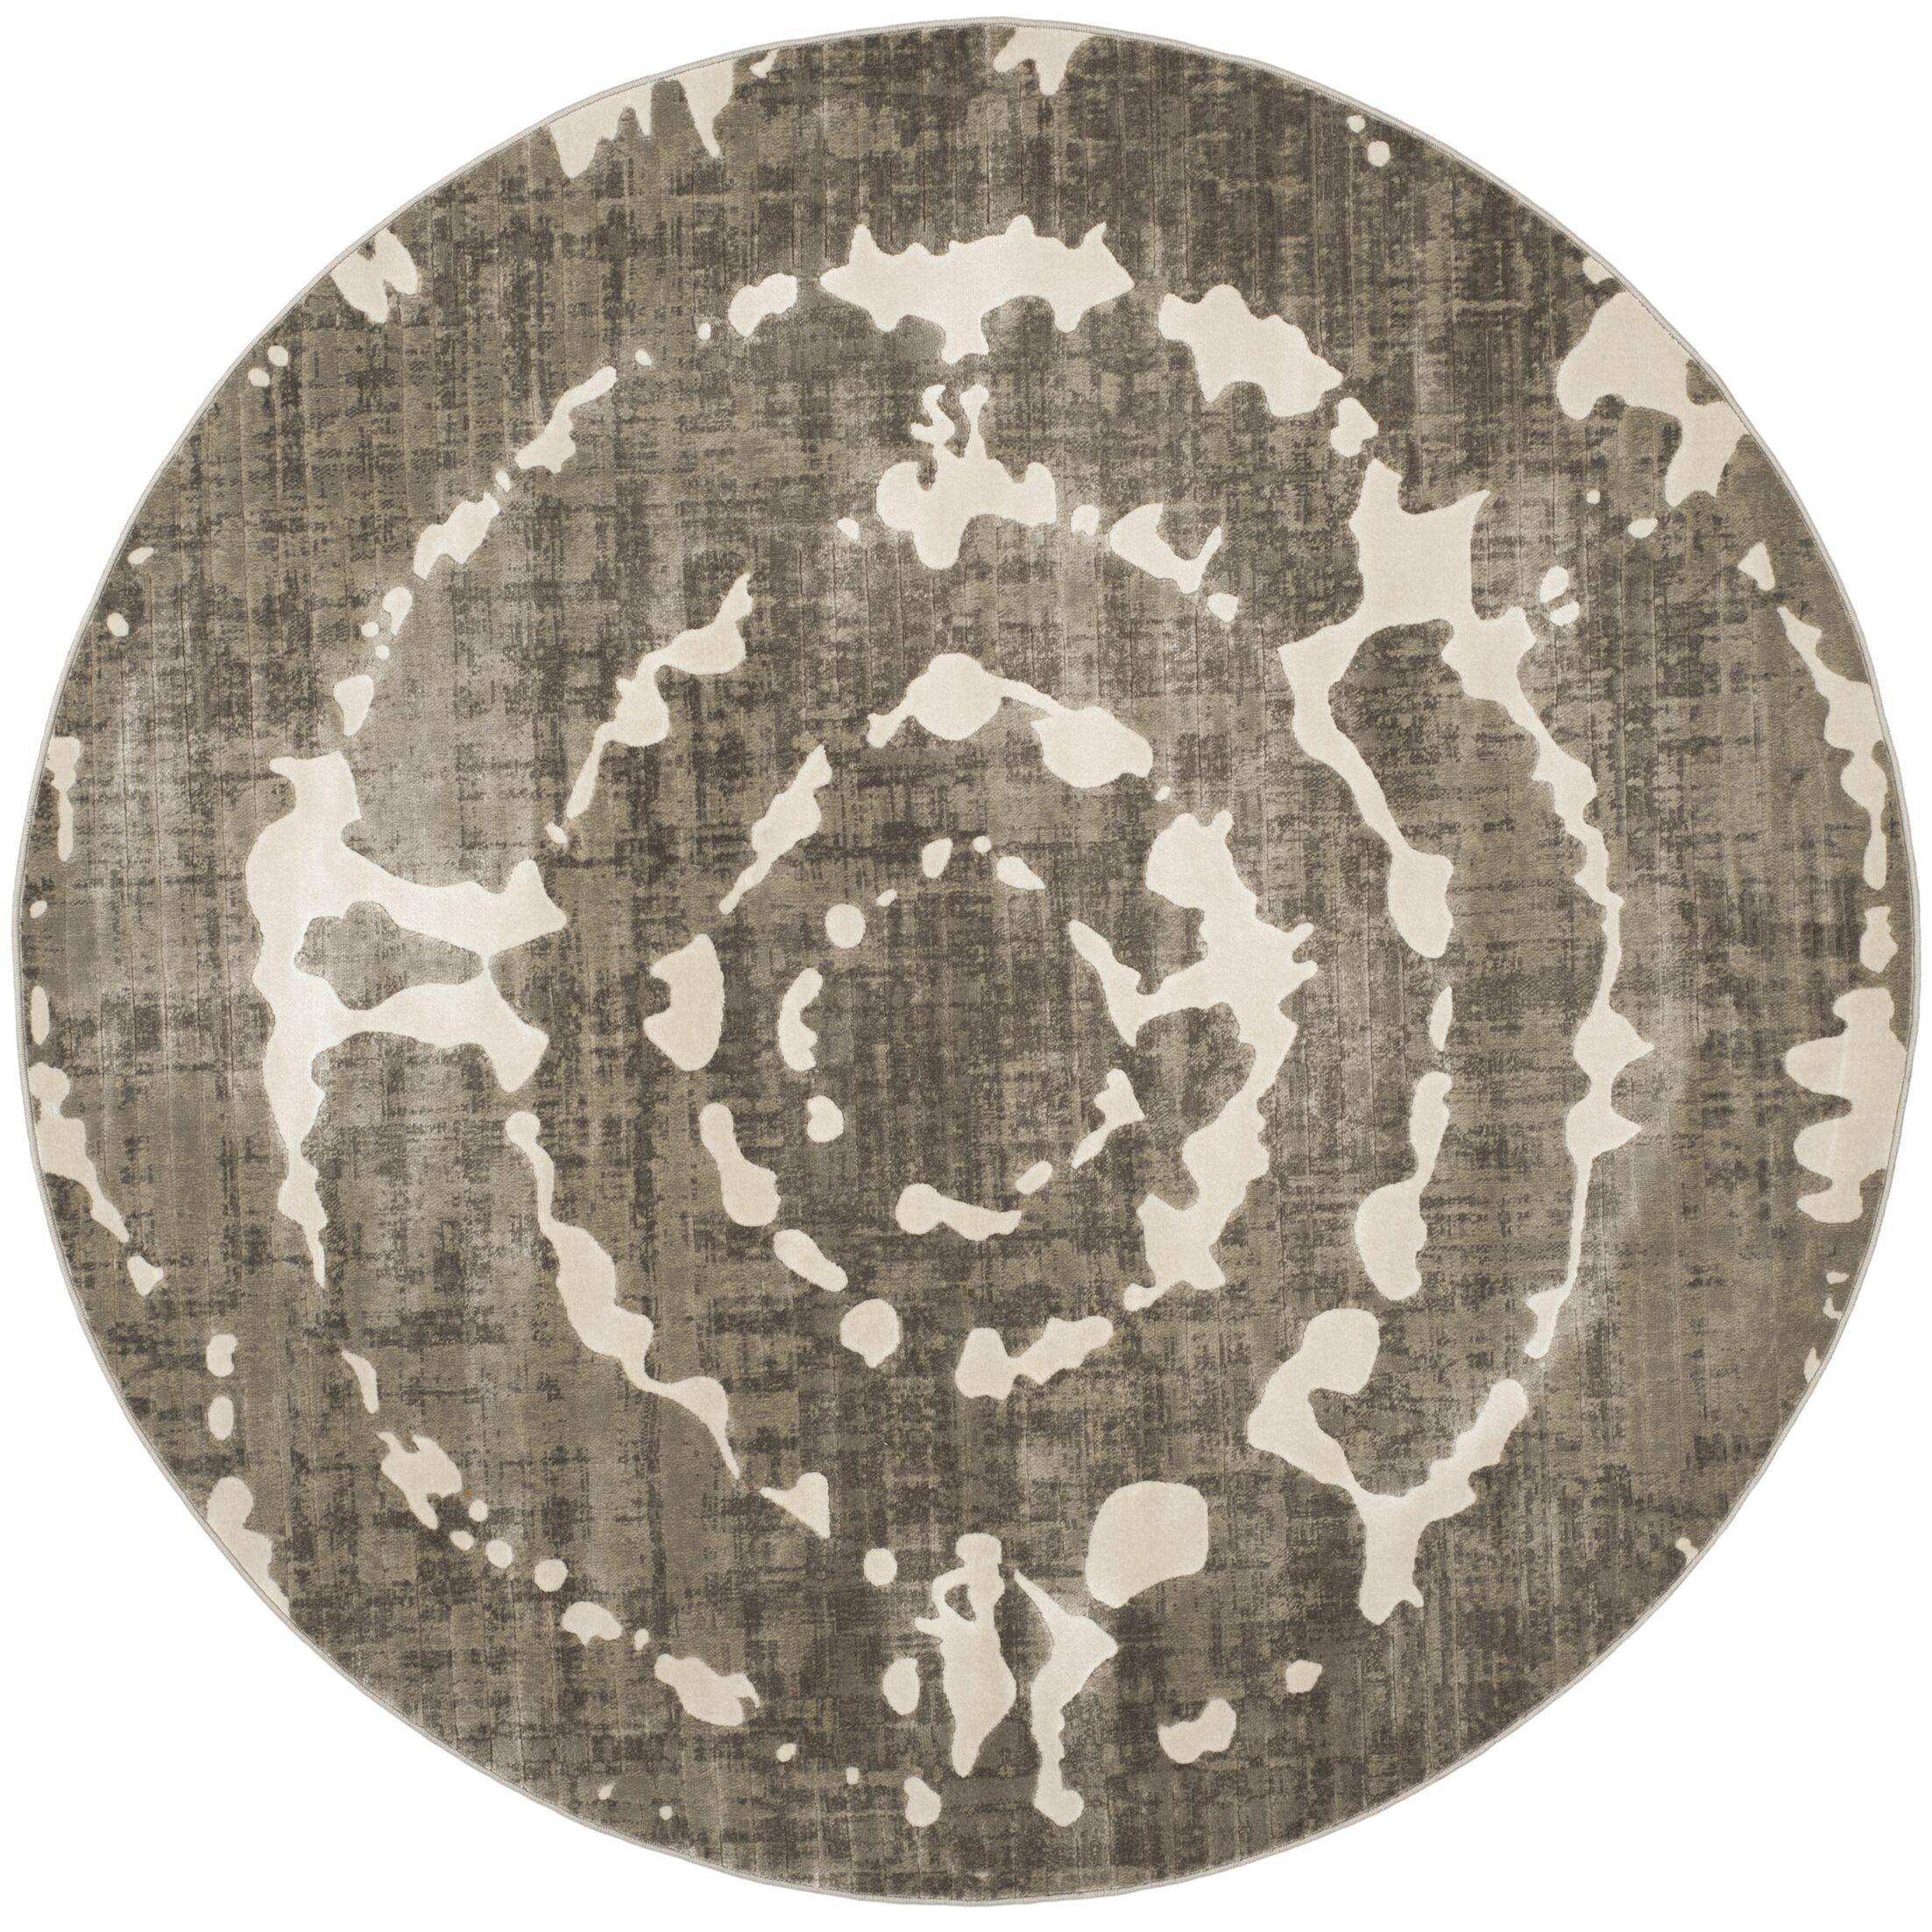 Chaima Gray/Ivory Area Rug Rug Size: Round 6'7